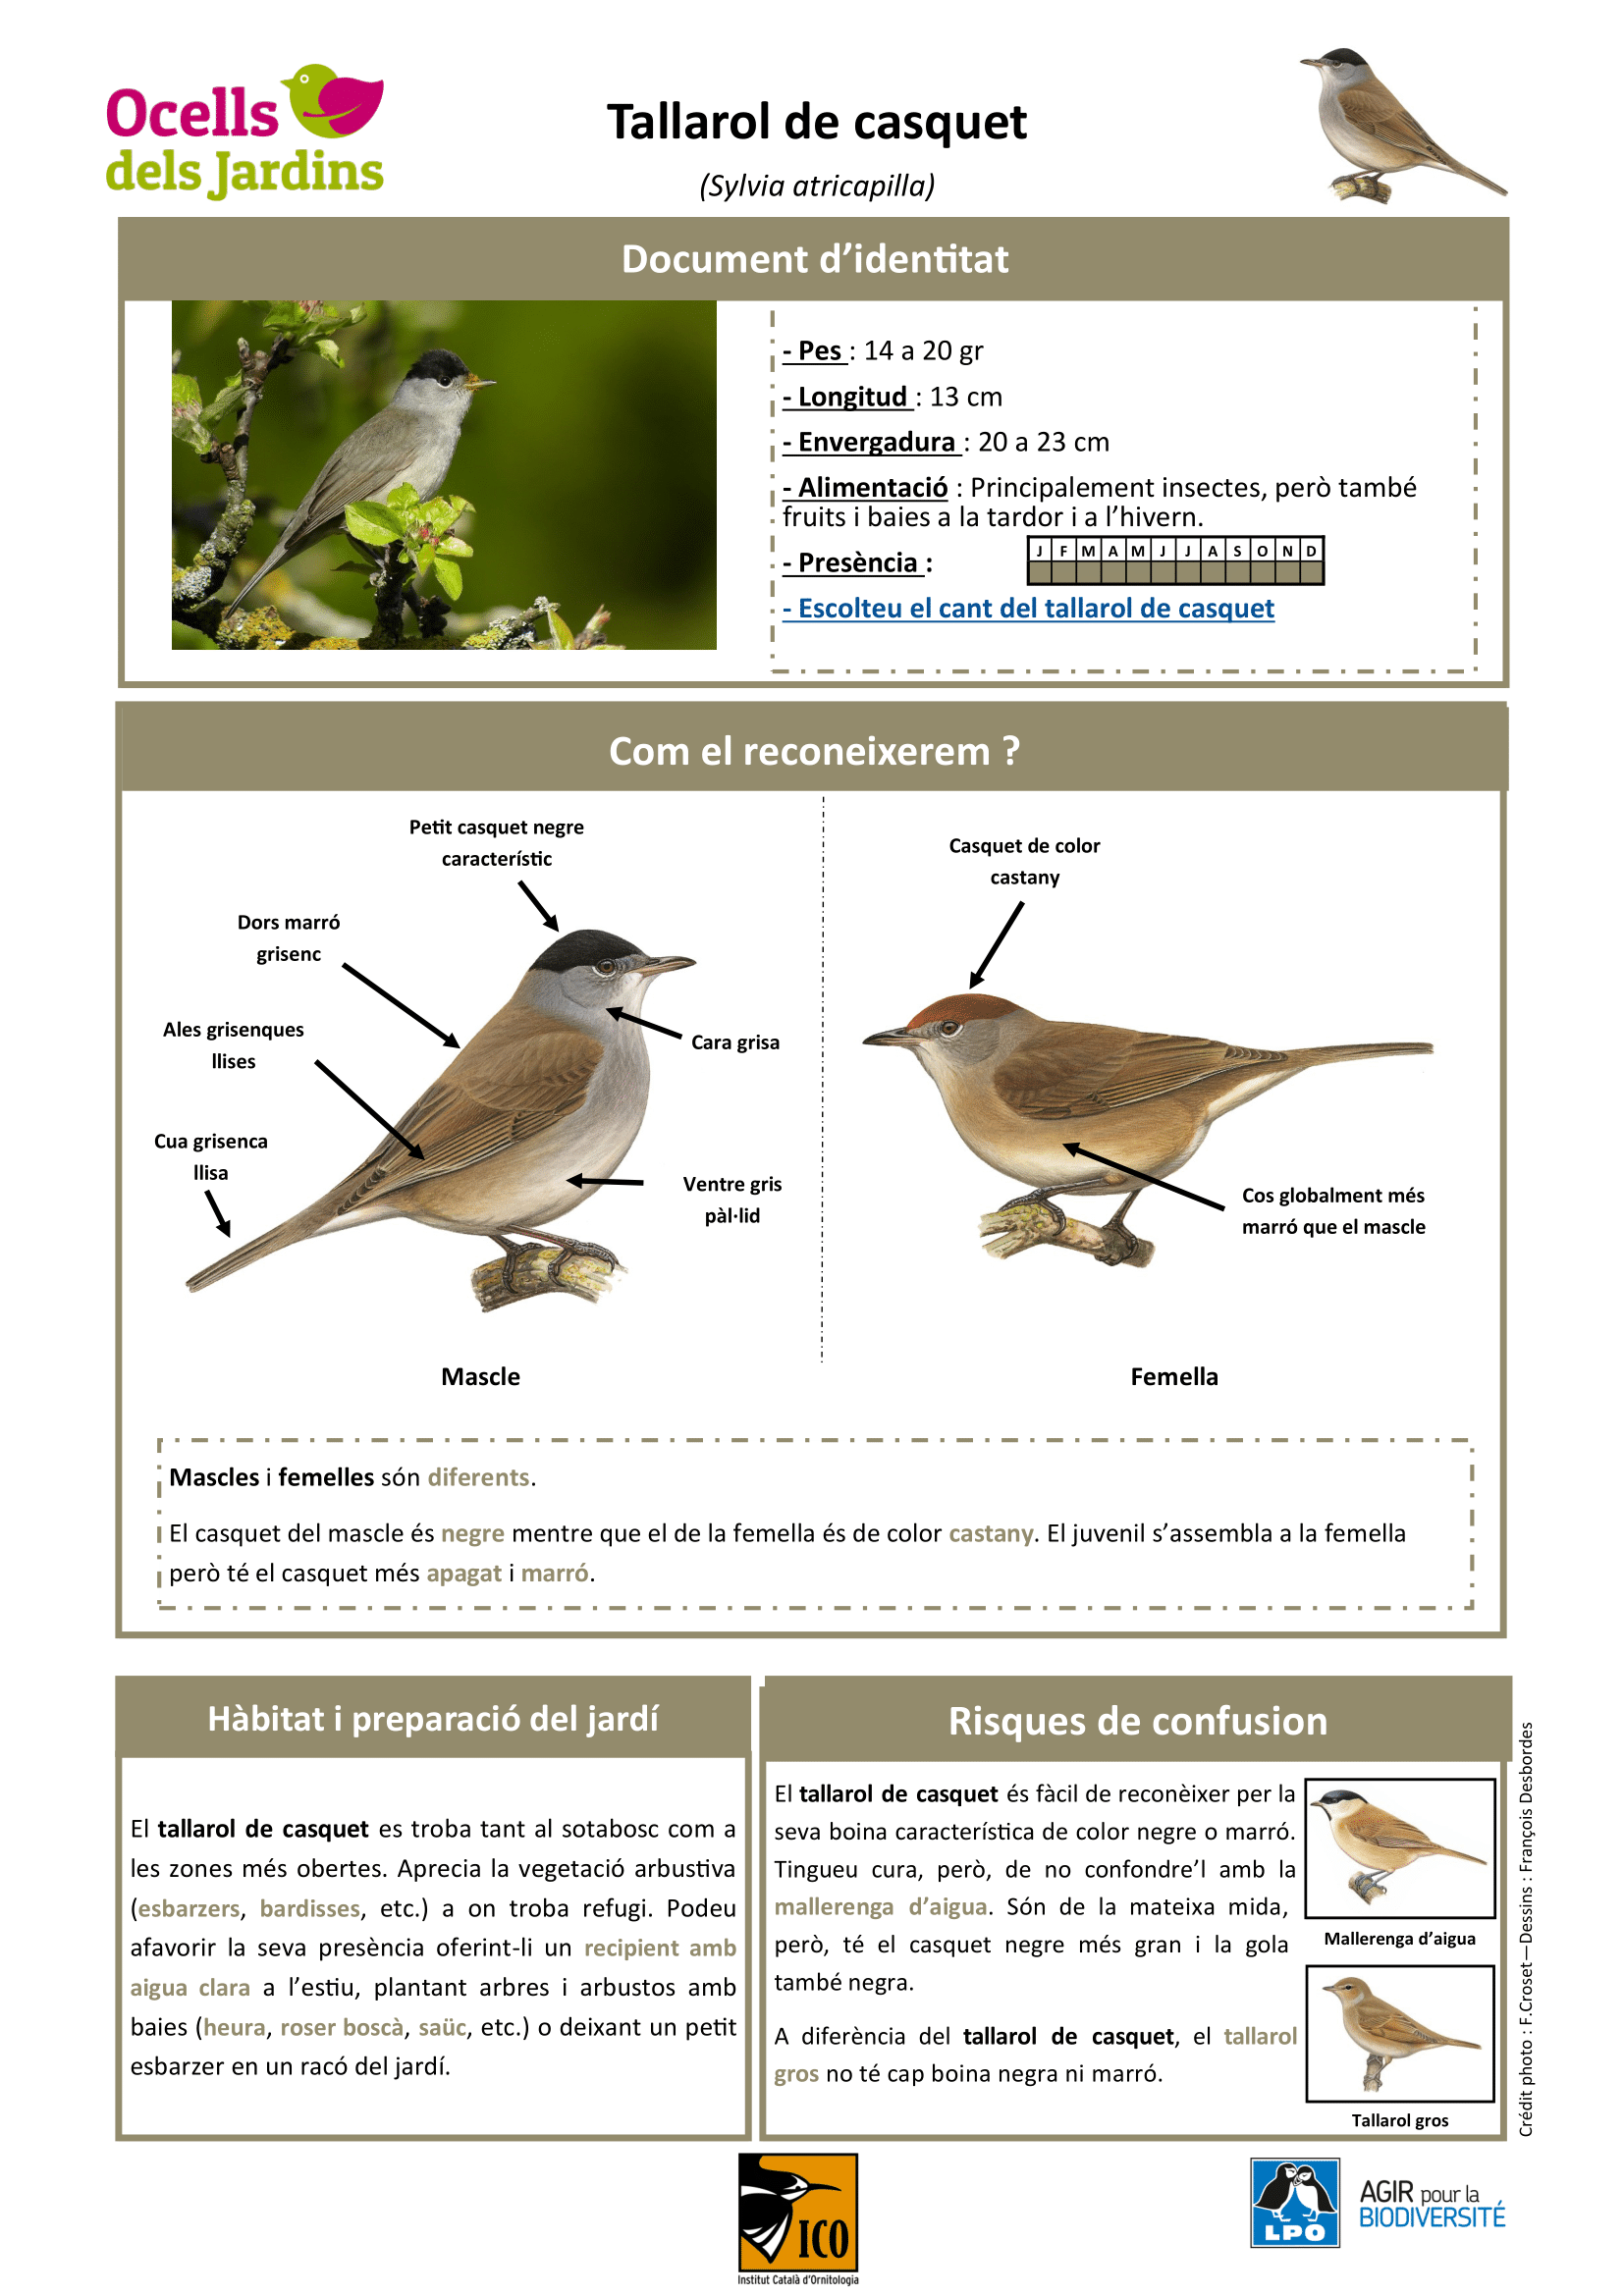 https://cdnfiles1.biolovision.net/www.ocellsdelsjardins.cat/userfiles/tallaroldecasquet-1.png